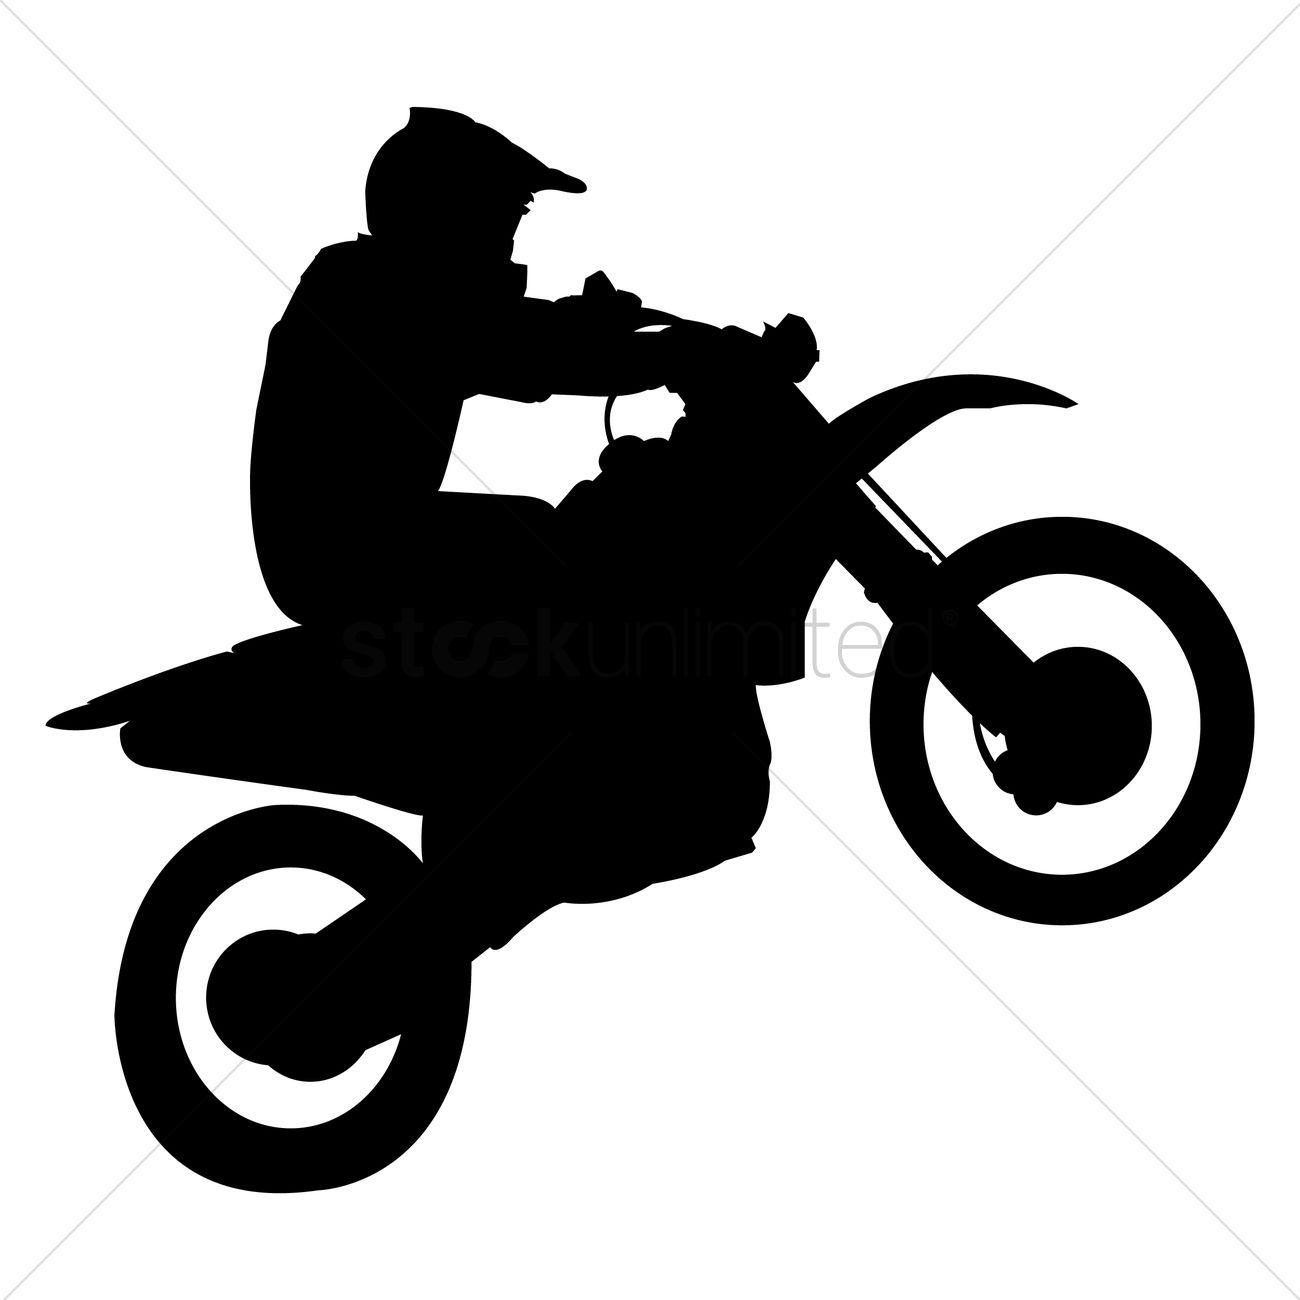 stuntman on motorbike vector image 1822433 stockunlimited dirt bike clipart black and white dirt bike clip art word